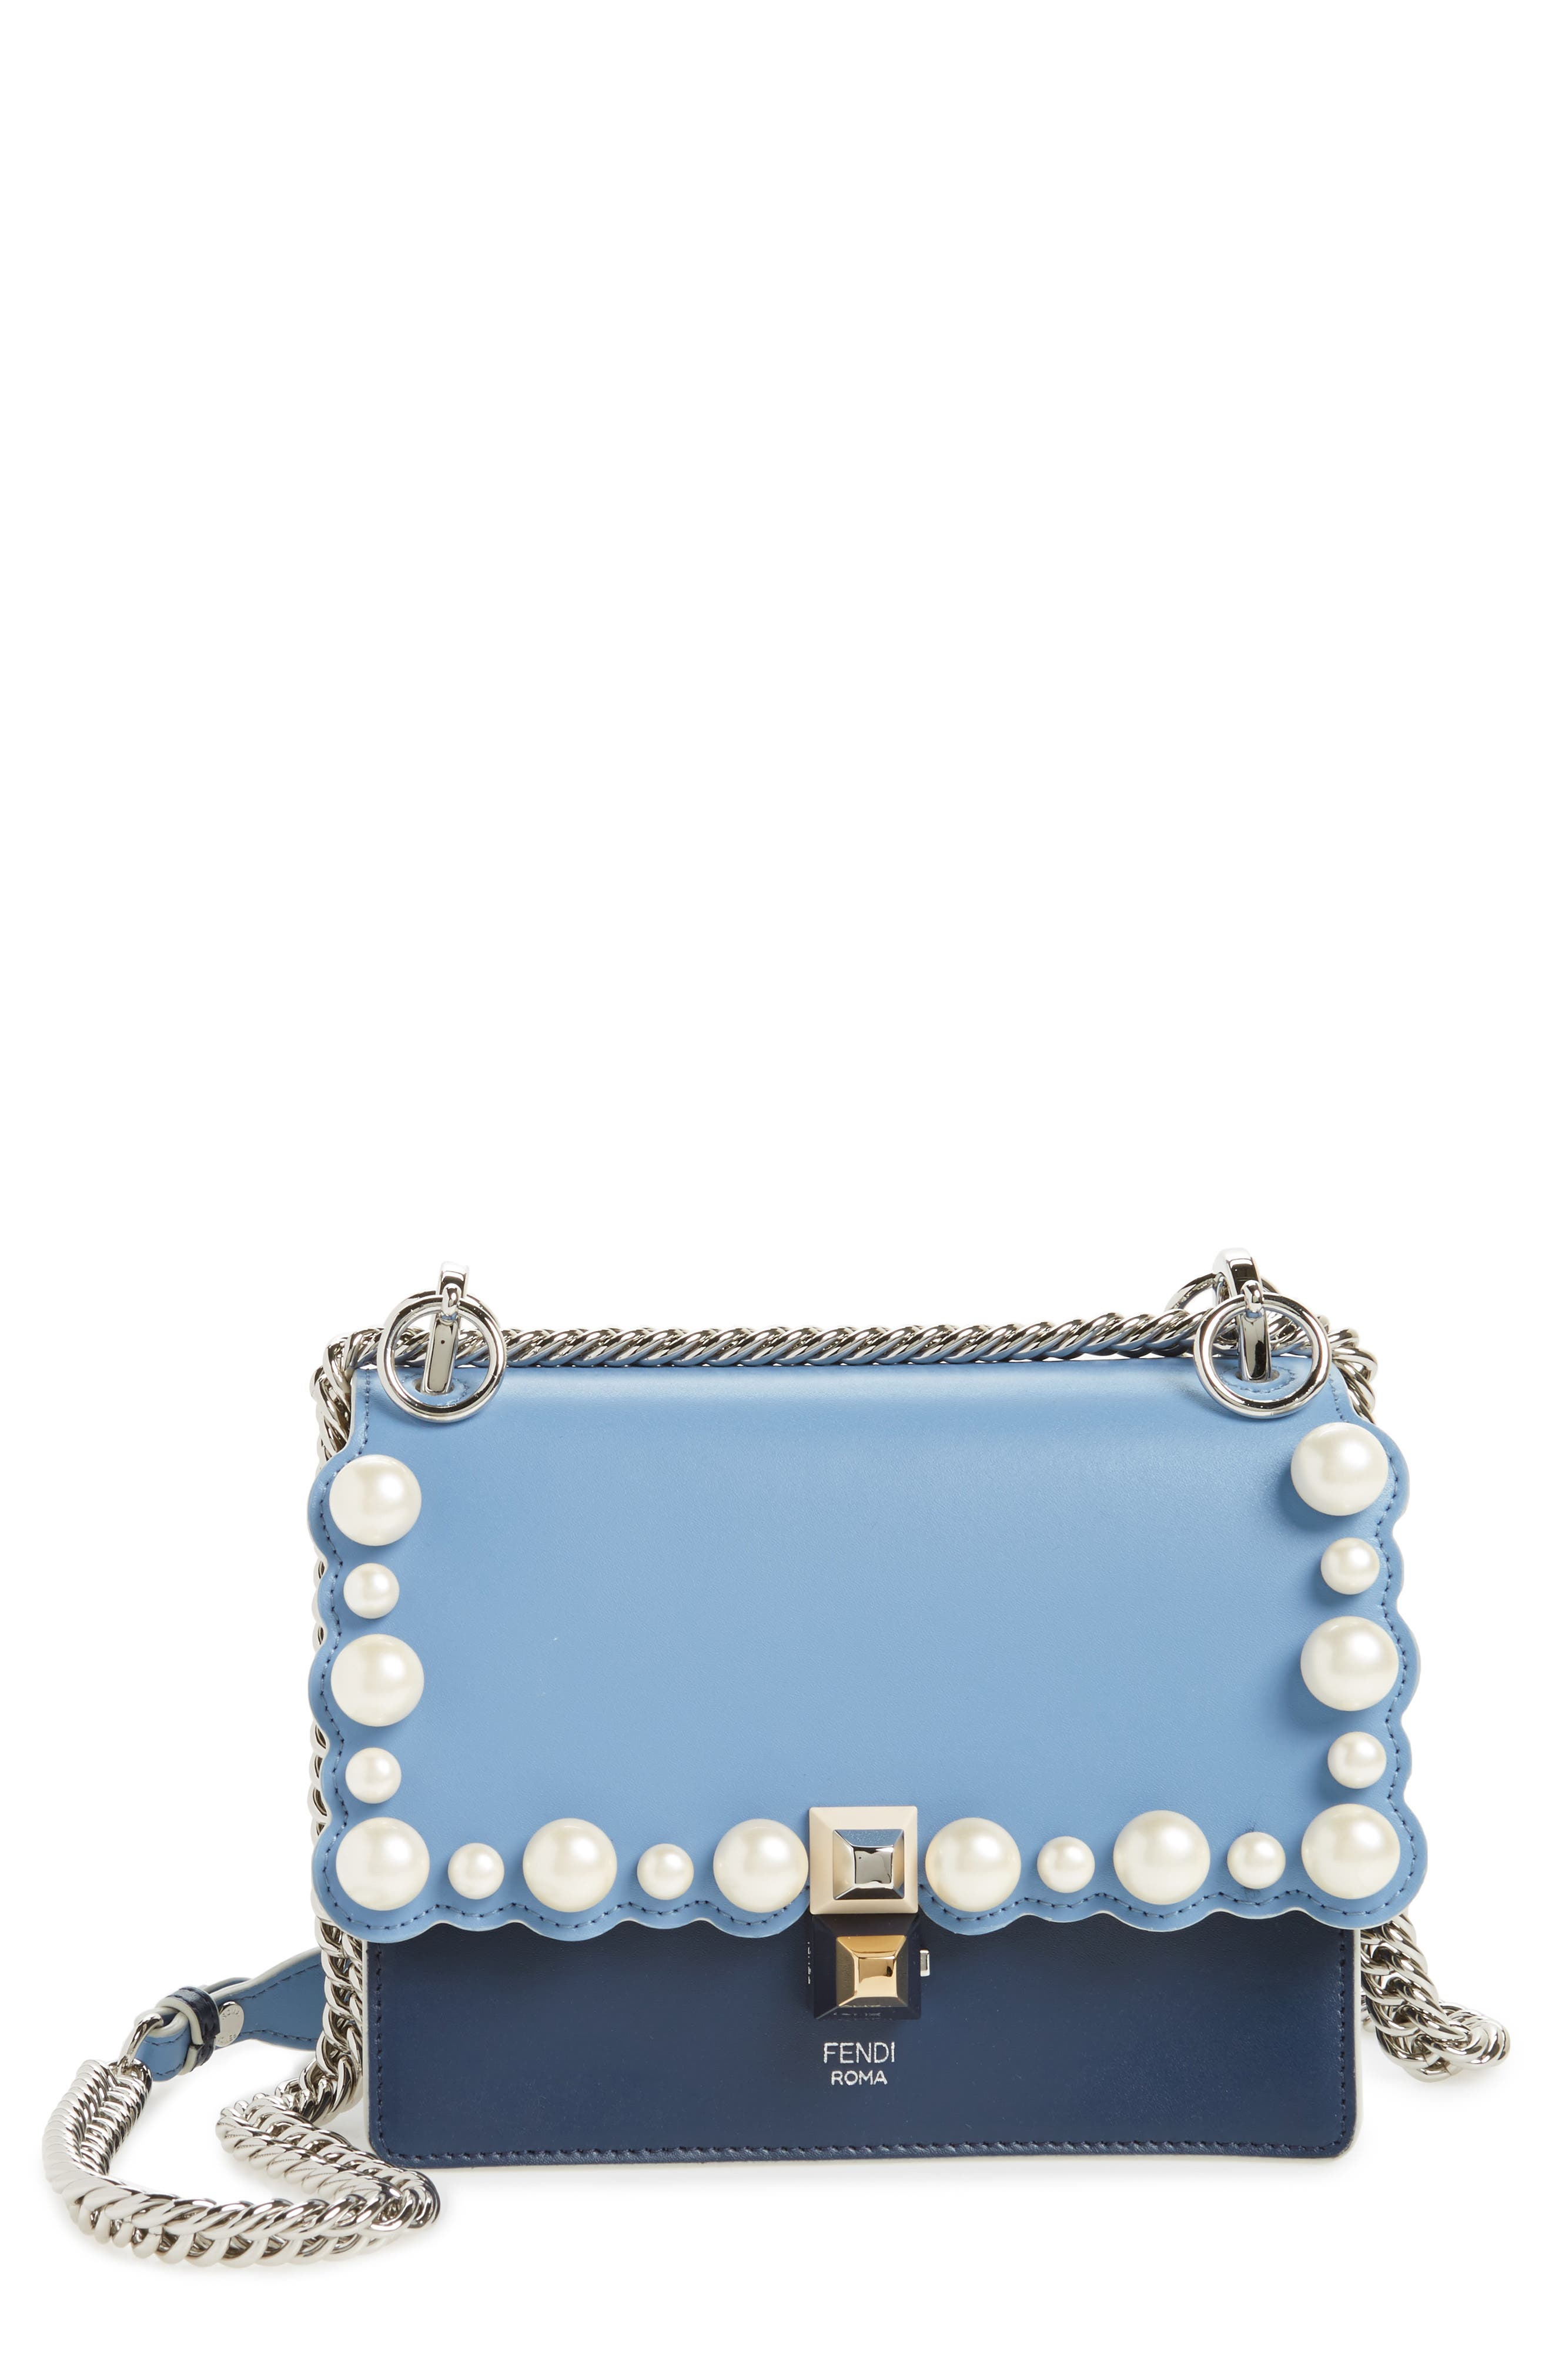 593373c282d5 Fendi Mini Kan I Imitation Pearl Scallop Leather Shoulder Bag - Blue In  F11Cs Nebul